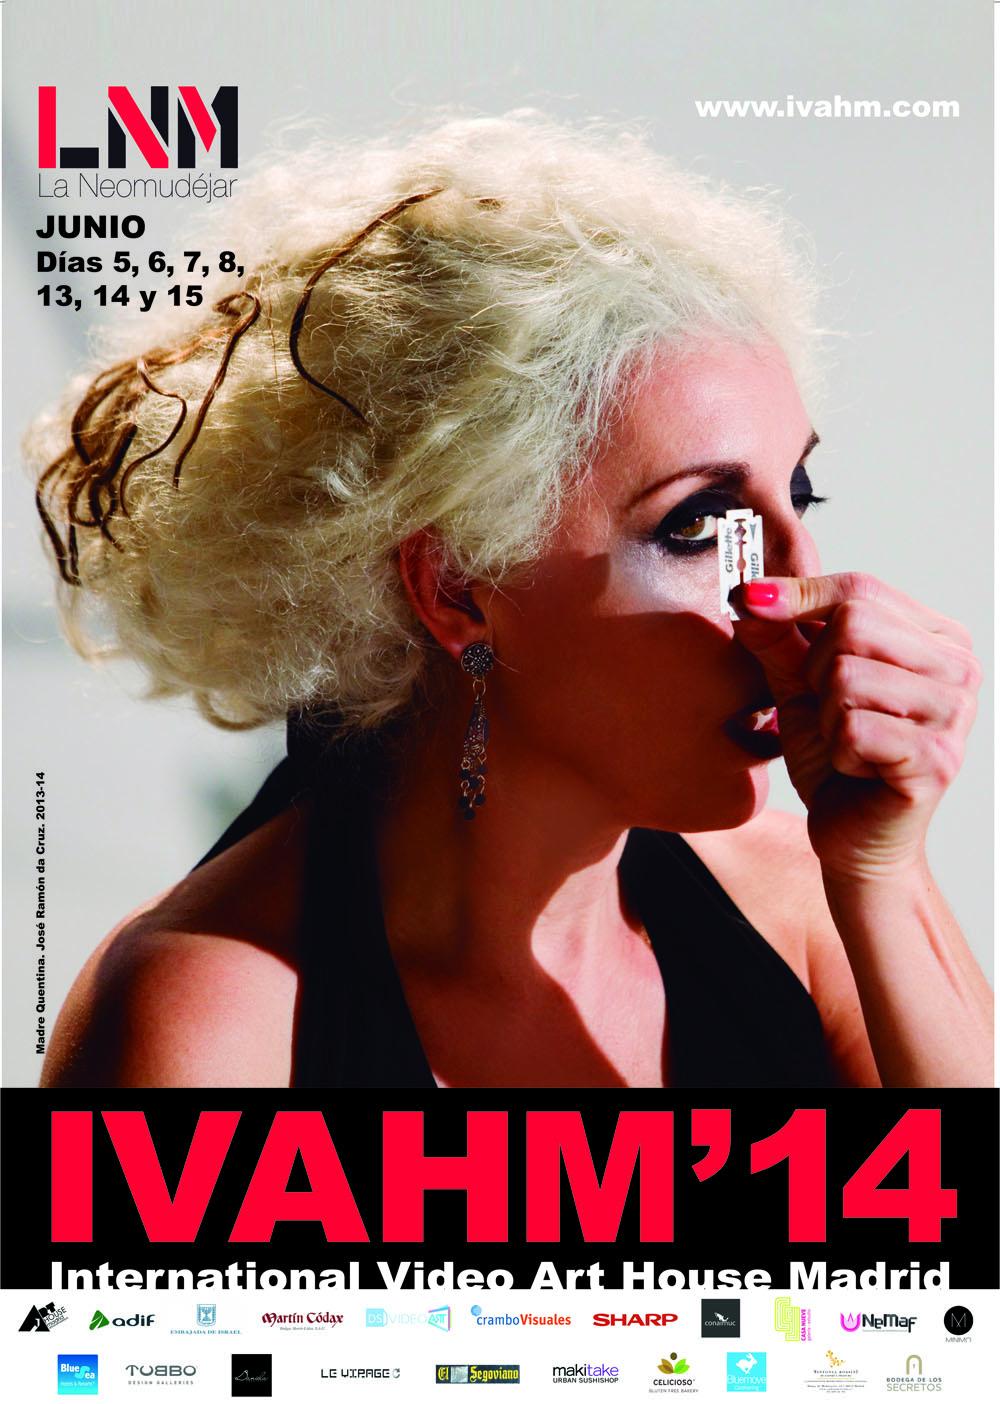 IVAHM14.indd